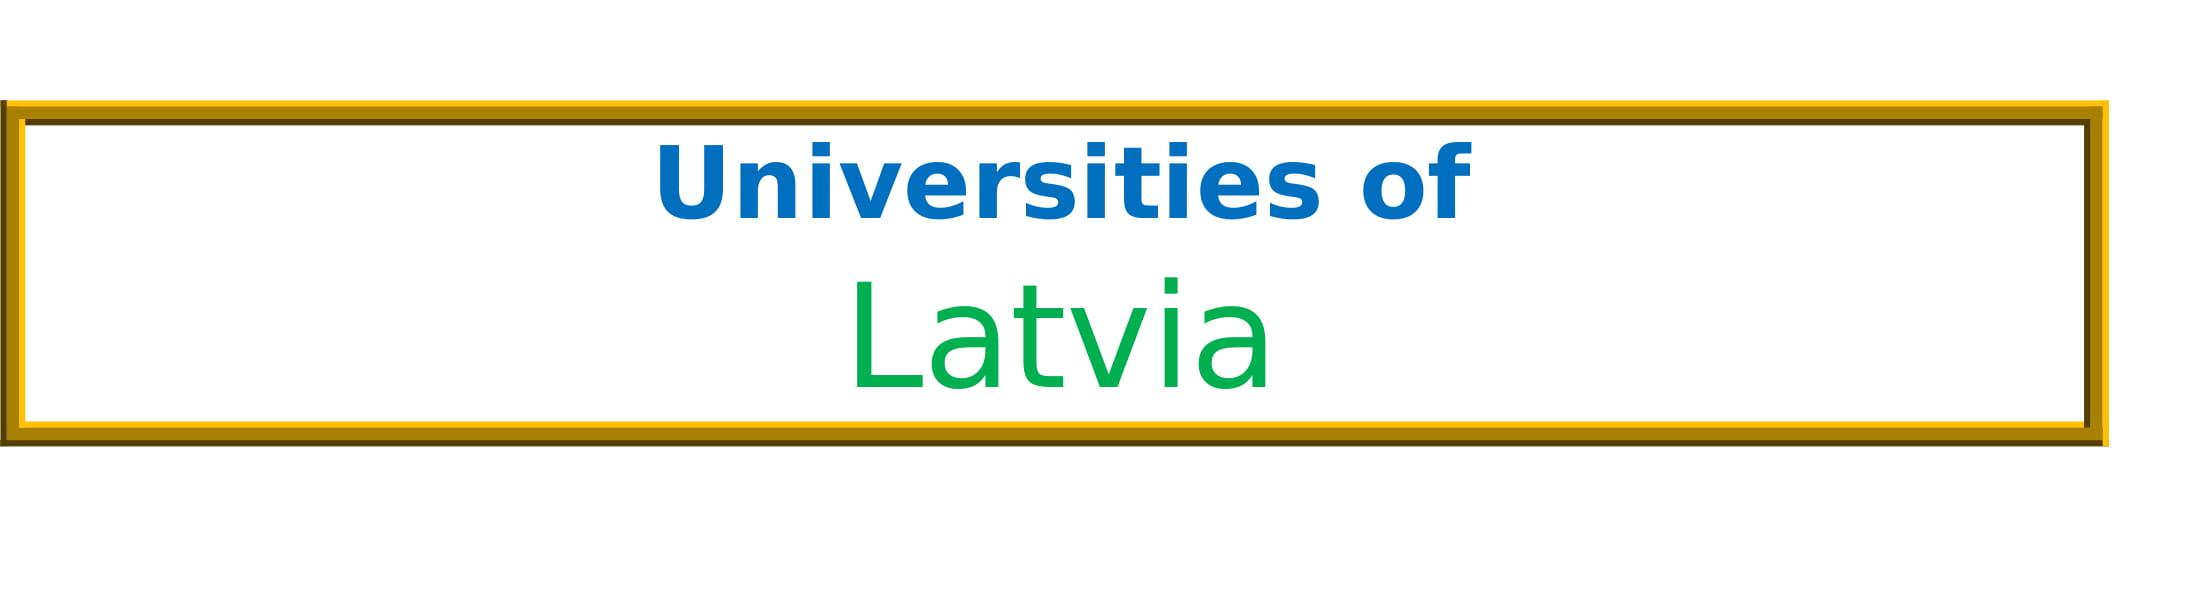 List of Universities in Latvia